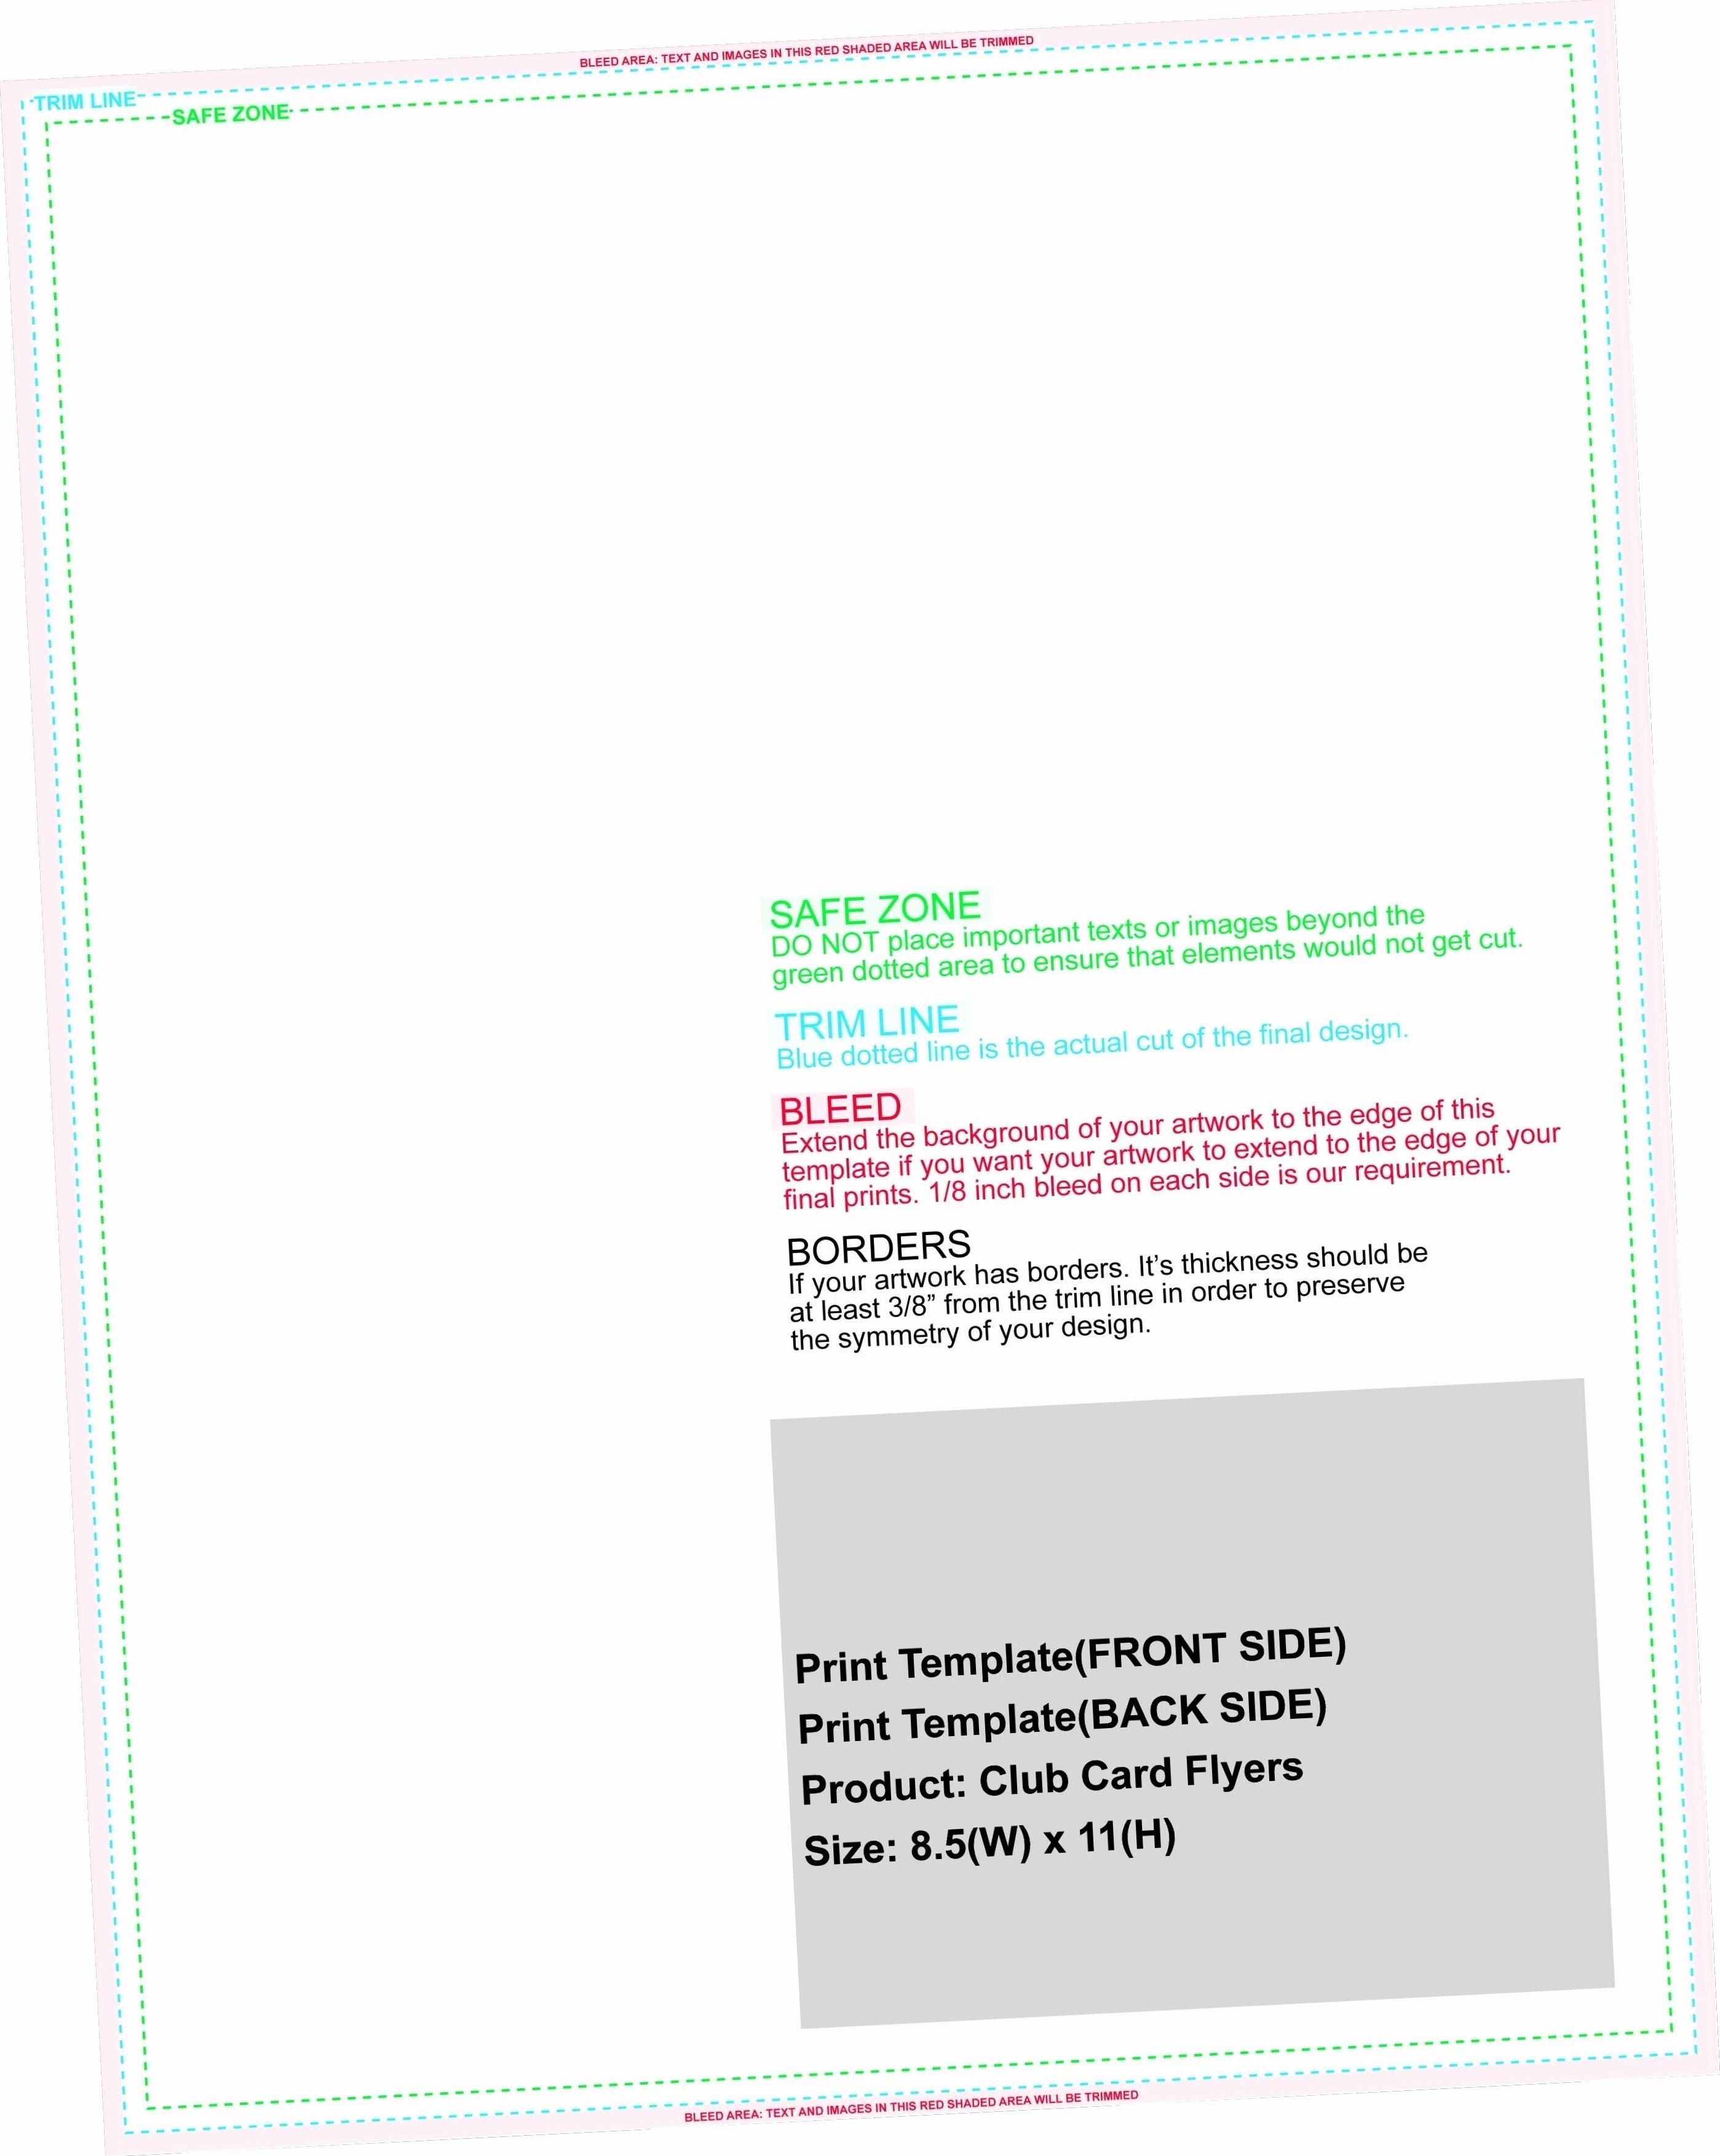 Make Your Own Business Cards Free Printable Lovely Make Your Own - Make Your Own Business Cards Free Printable